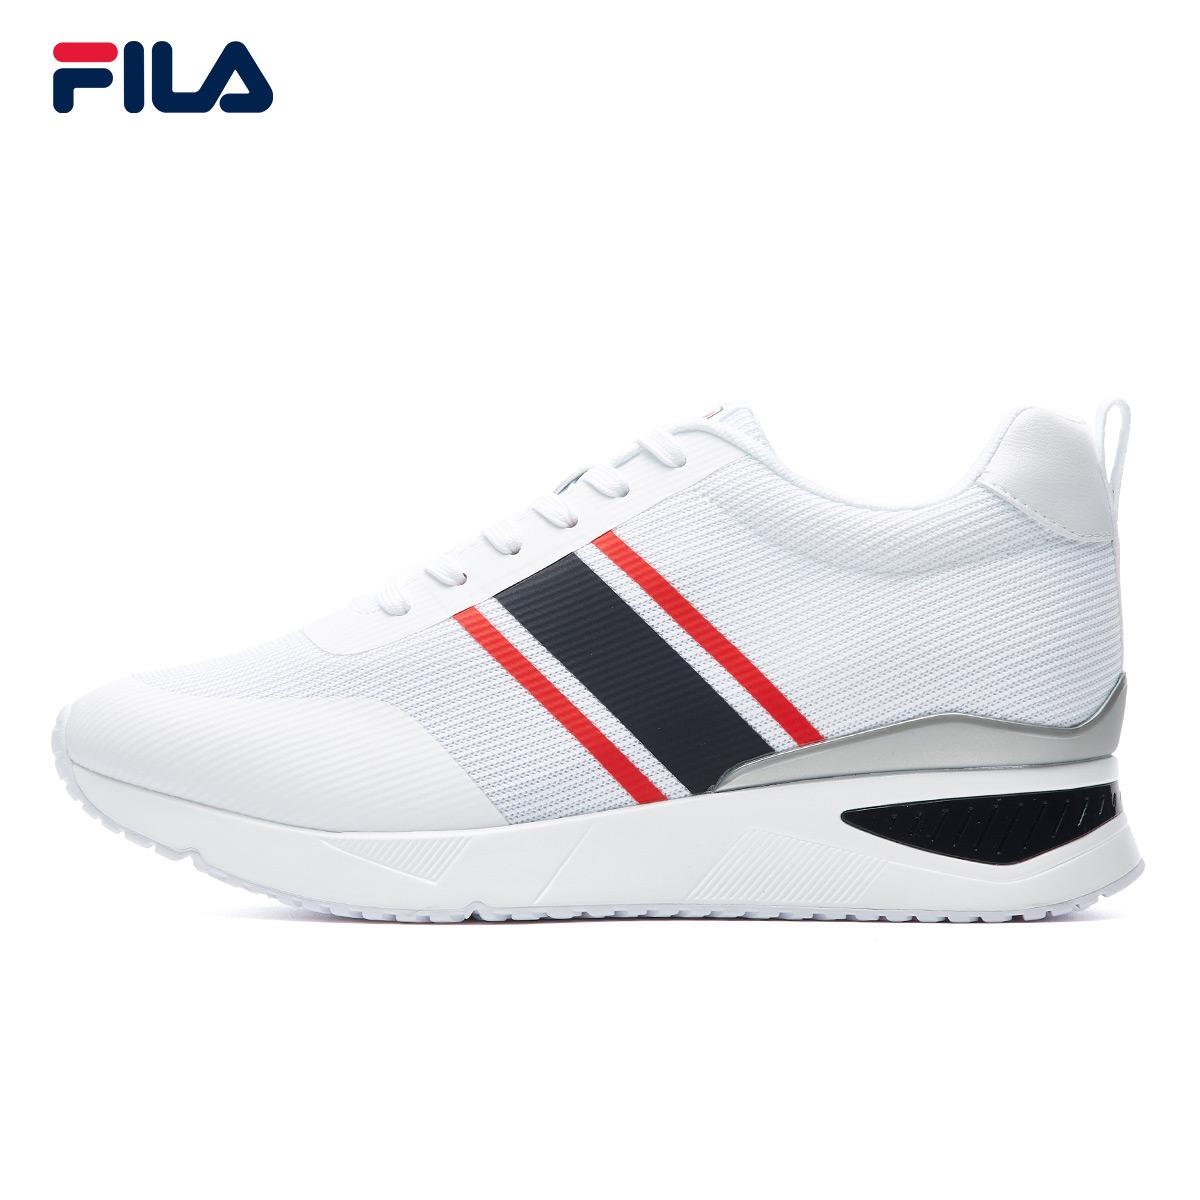 FILA斐乐女增高鞋2018夏季新款运动经典出街休闲鞋